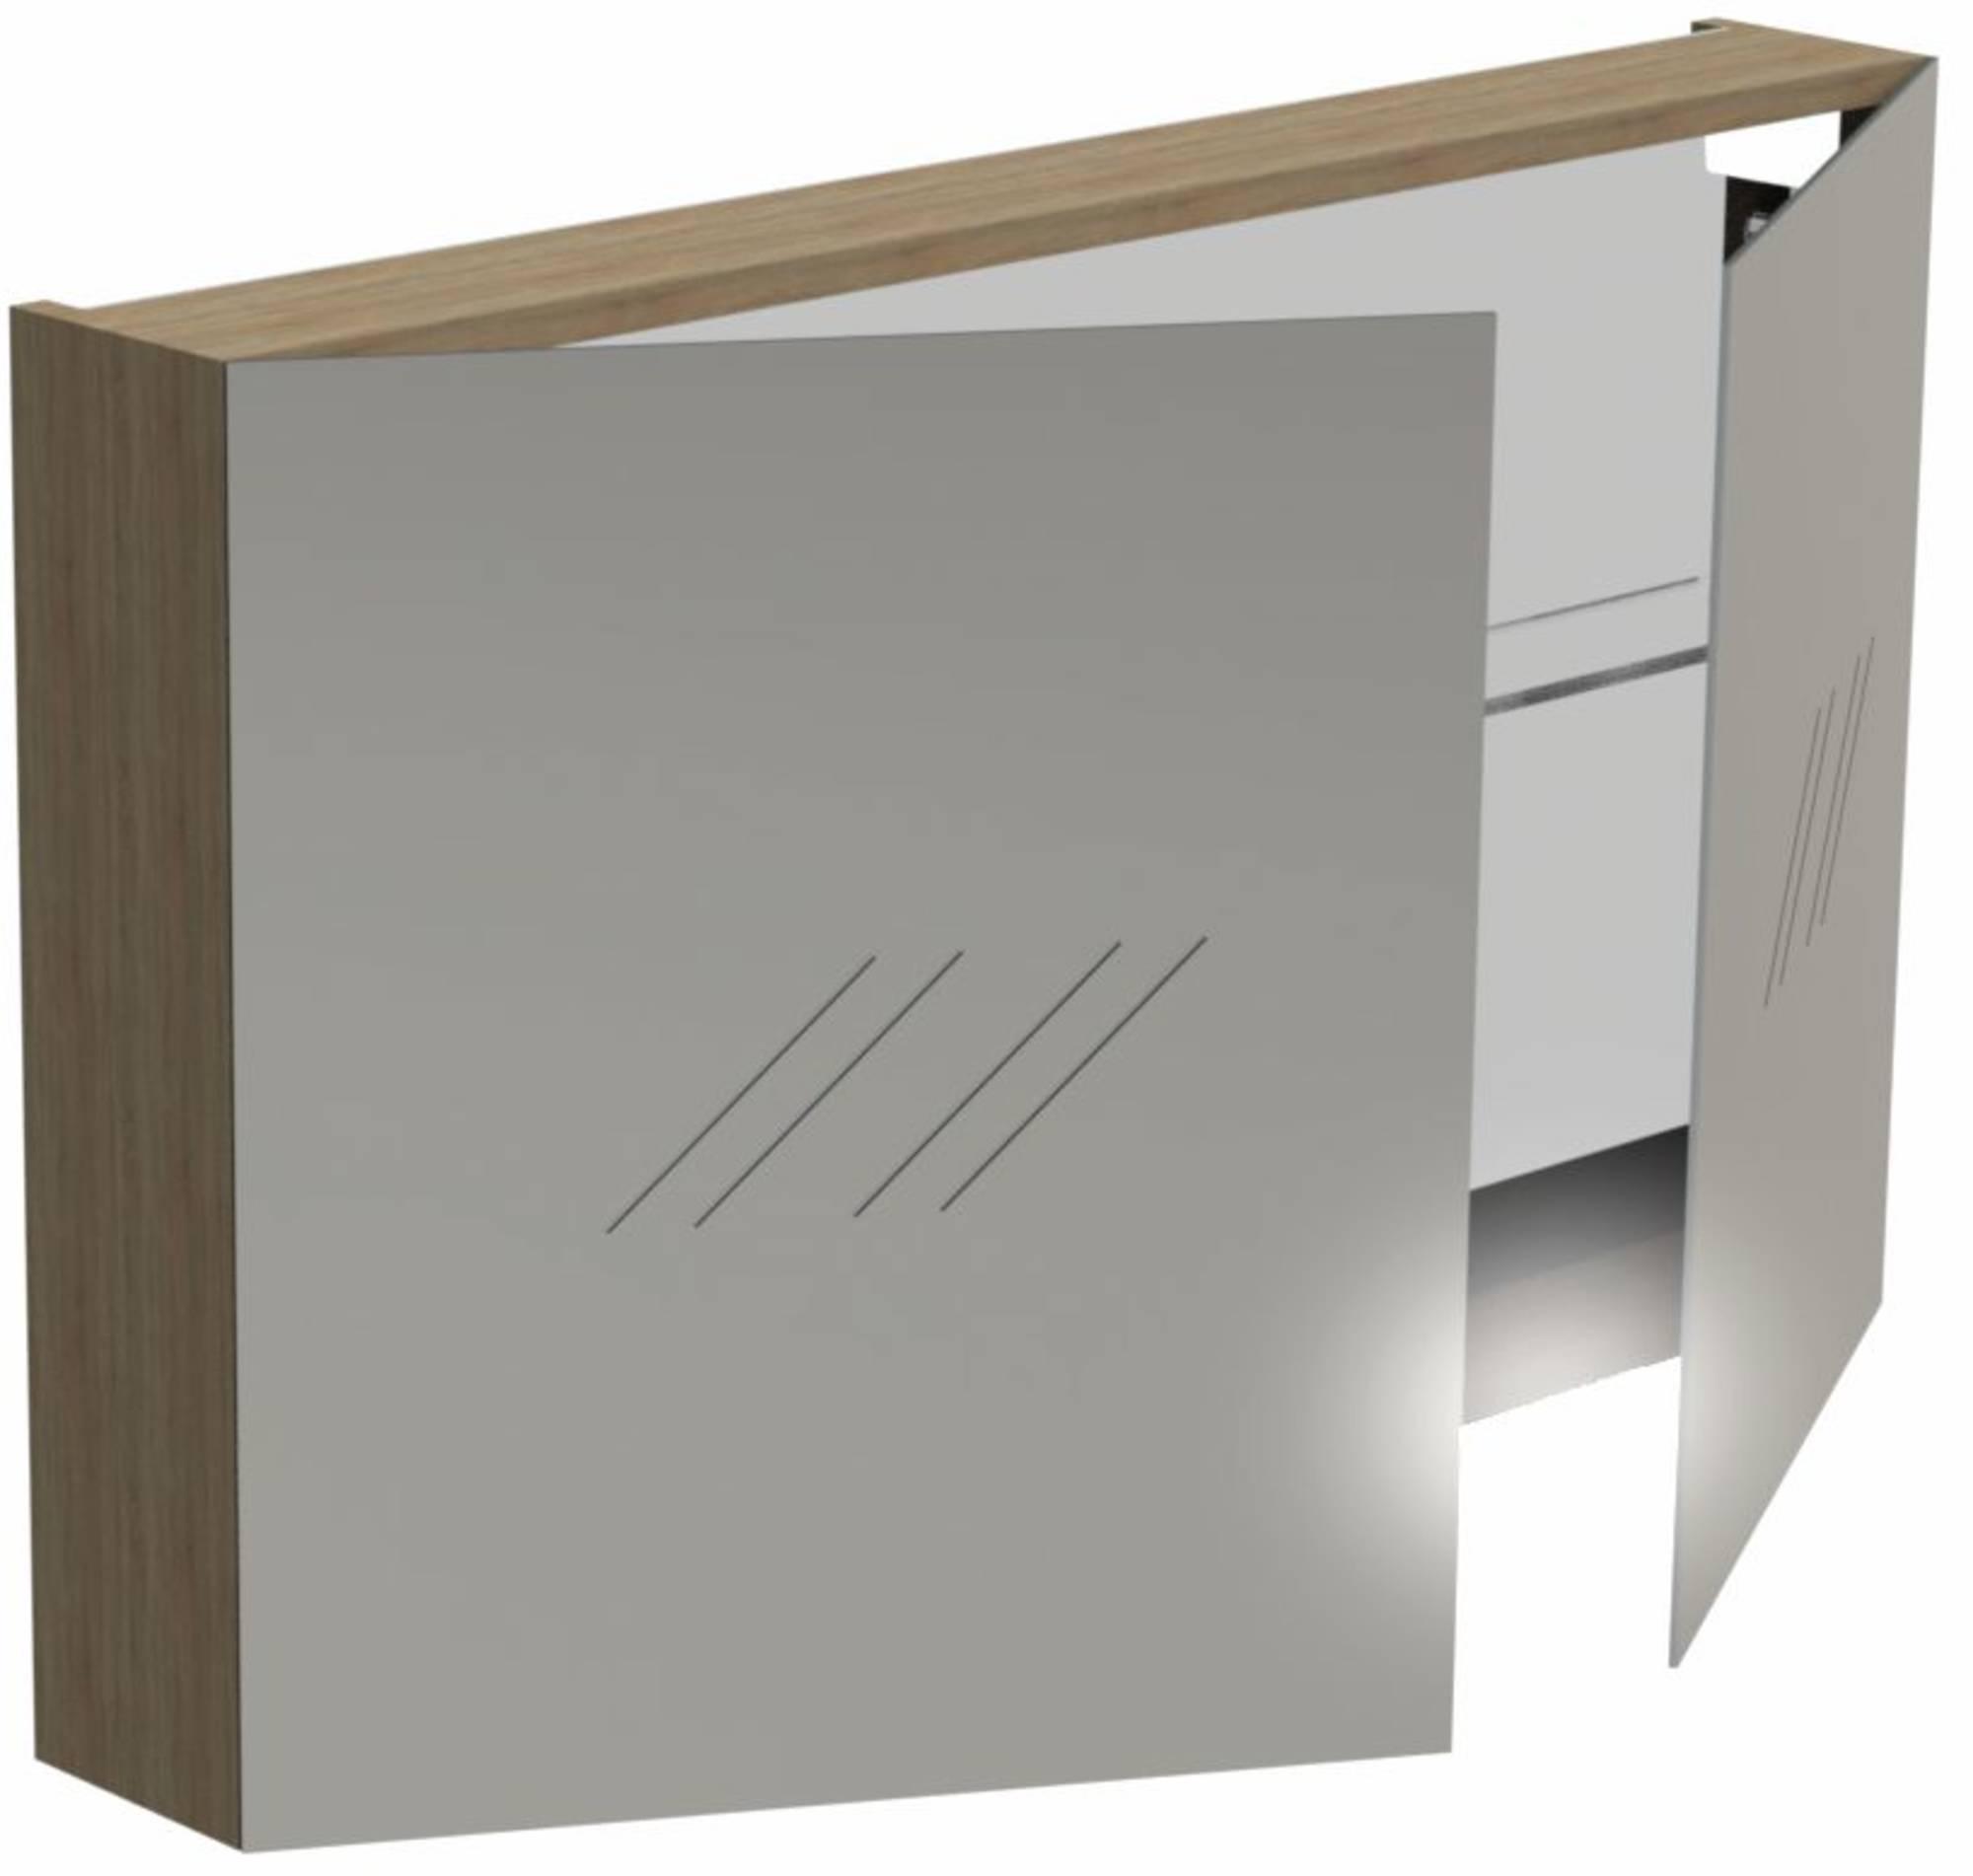 Thebalux Basic Wastafelbovenkast 100x13,5x60 cm Glans antraciet